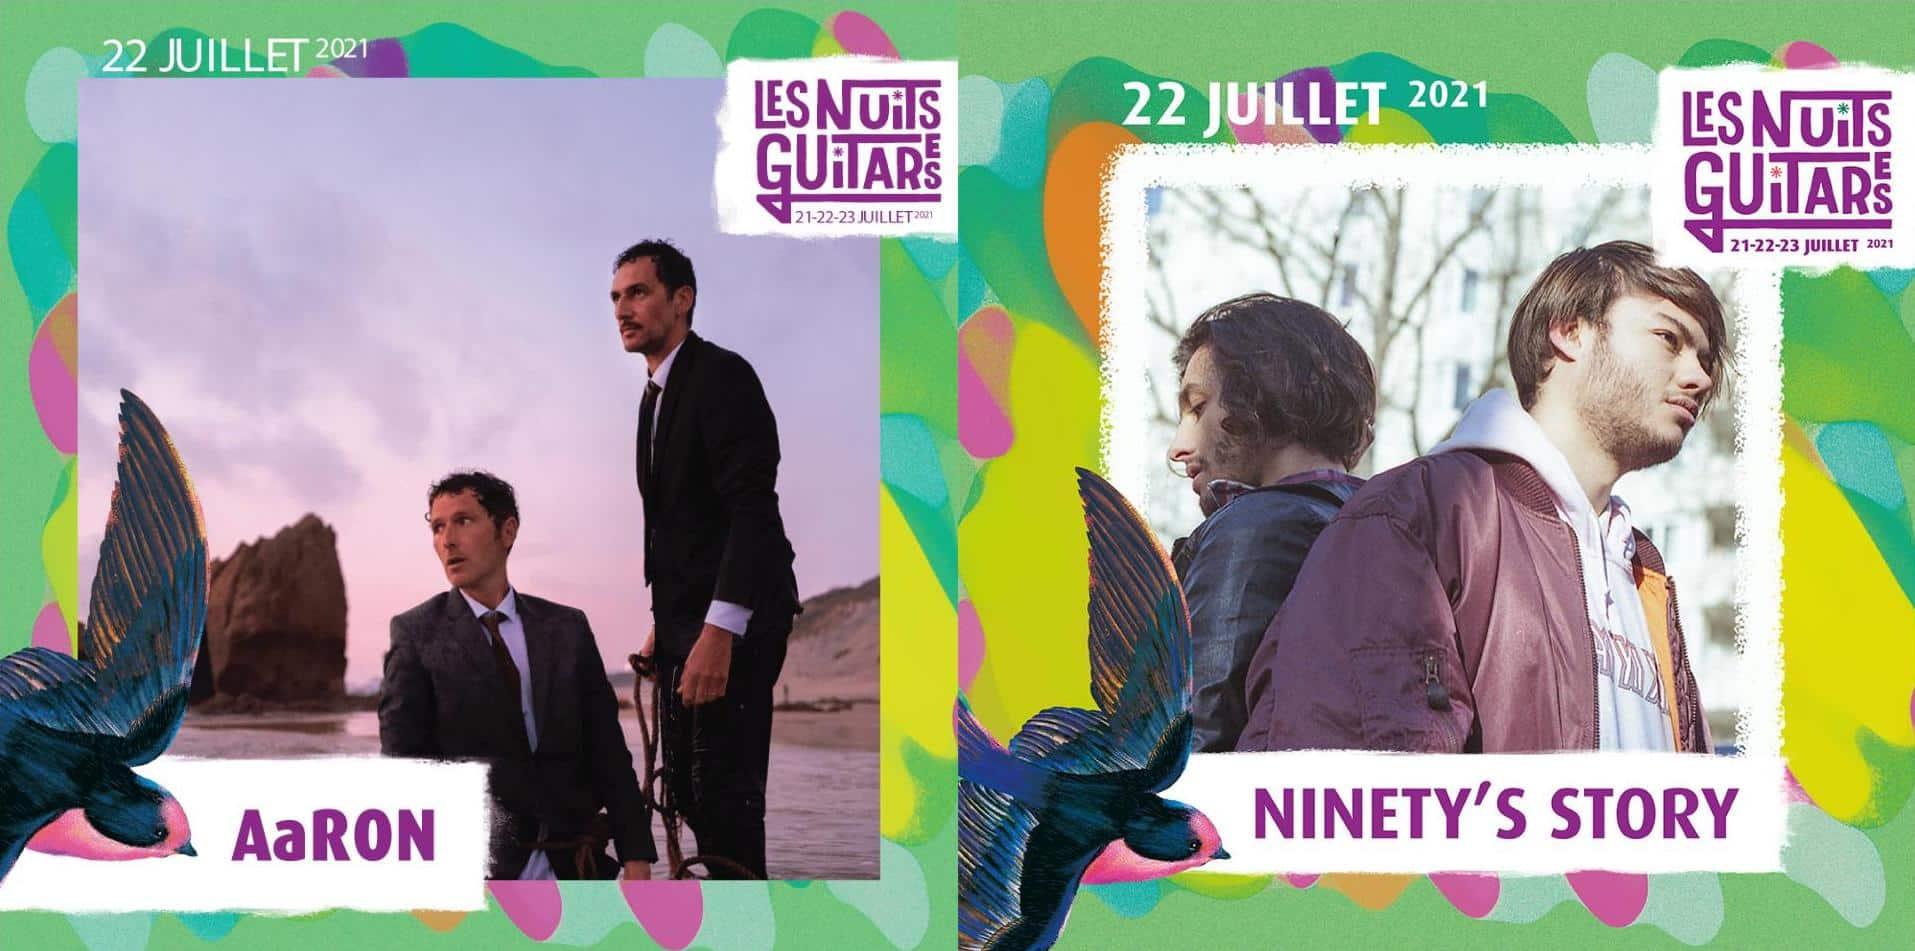 Aaron et Ninety Story Visuel Festival Nuits Guitares